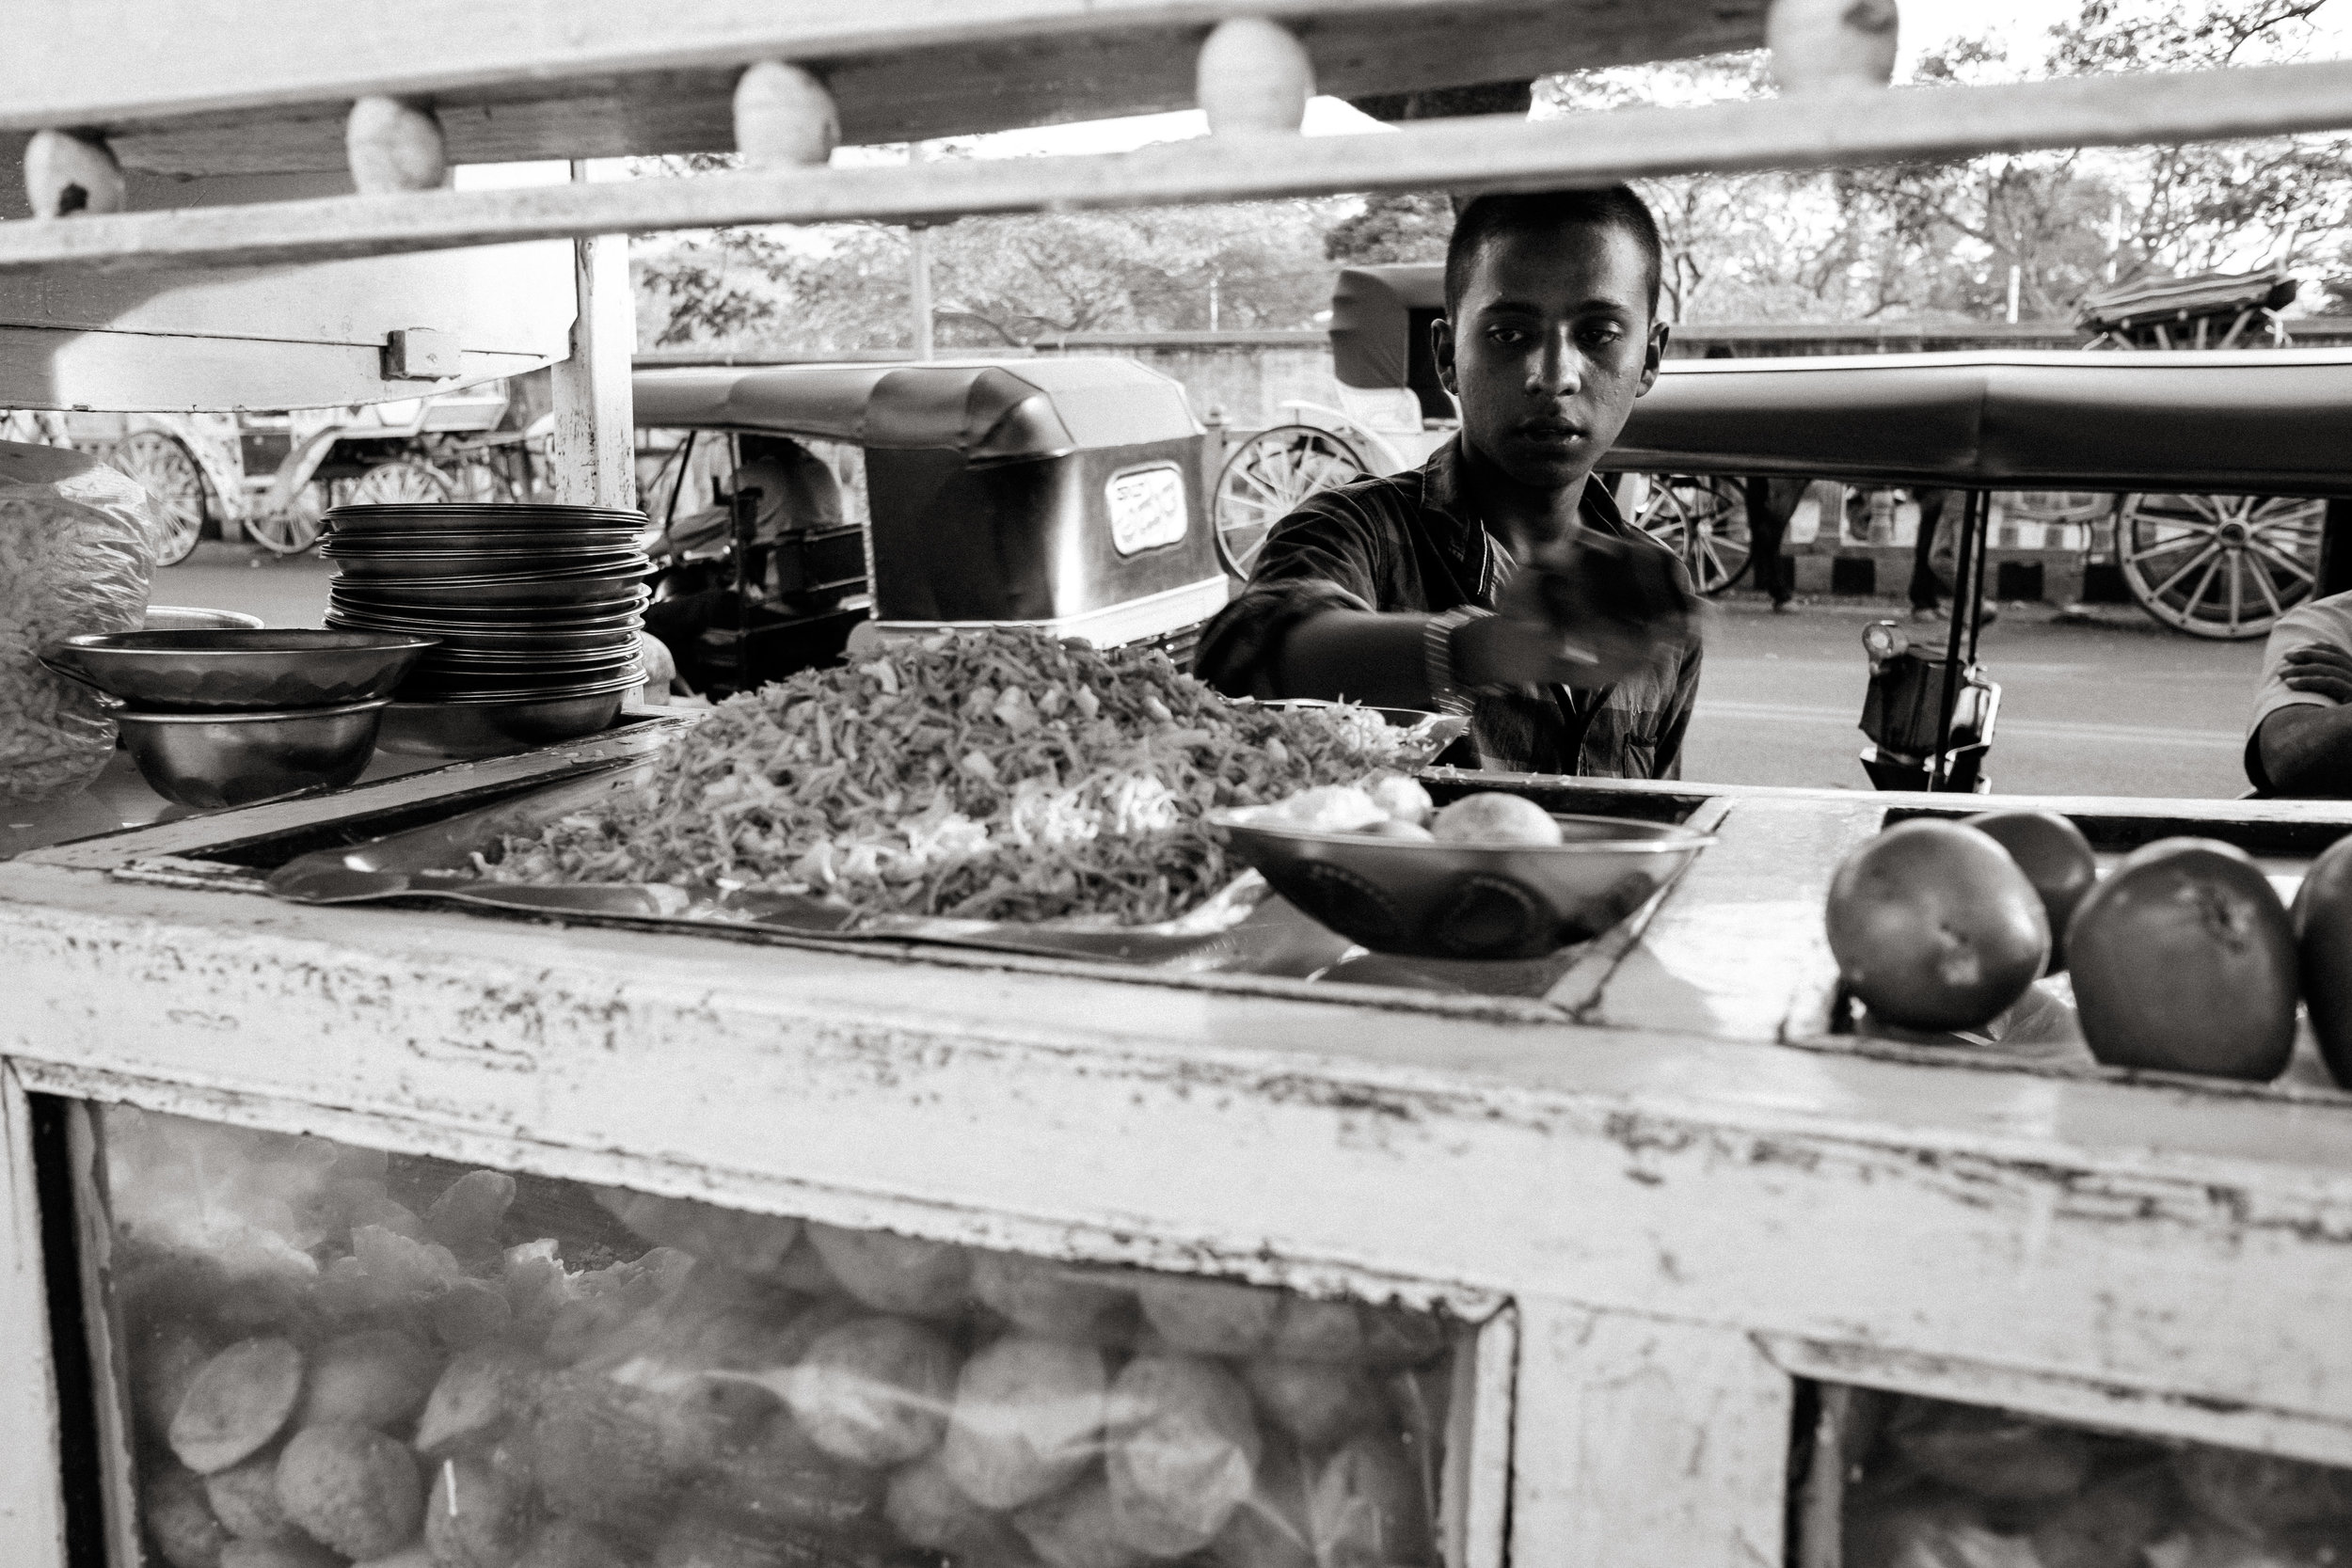 A street food vendor in Mysore, India.